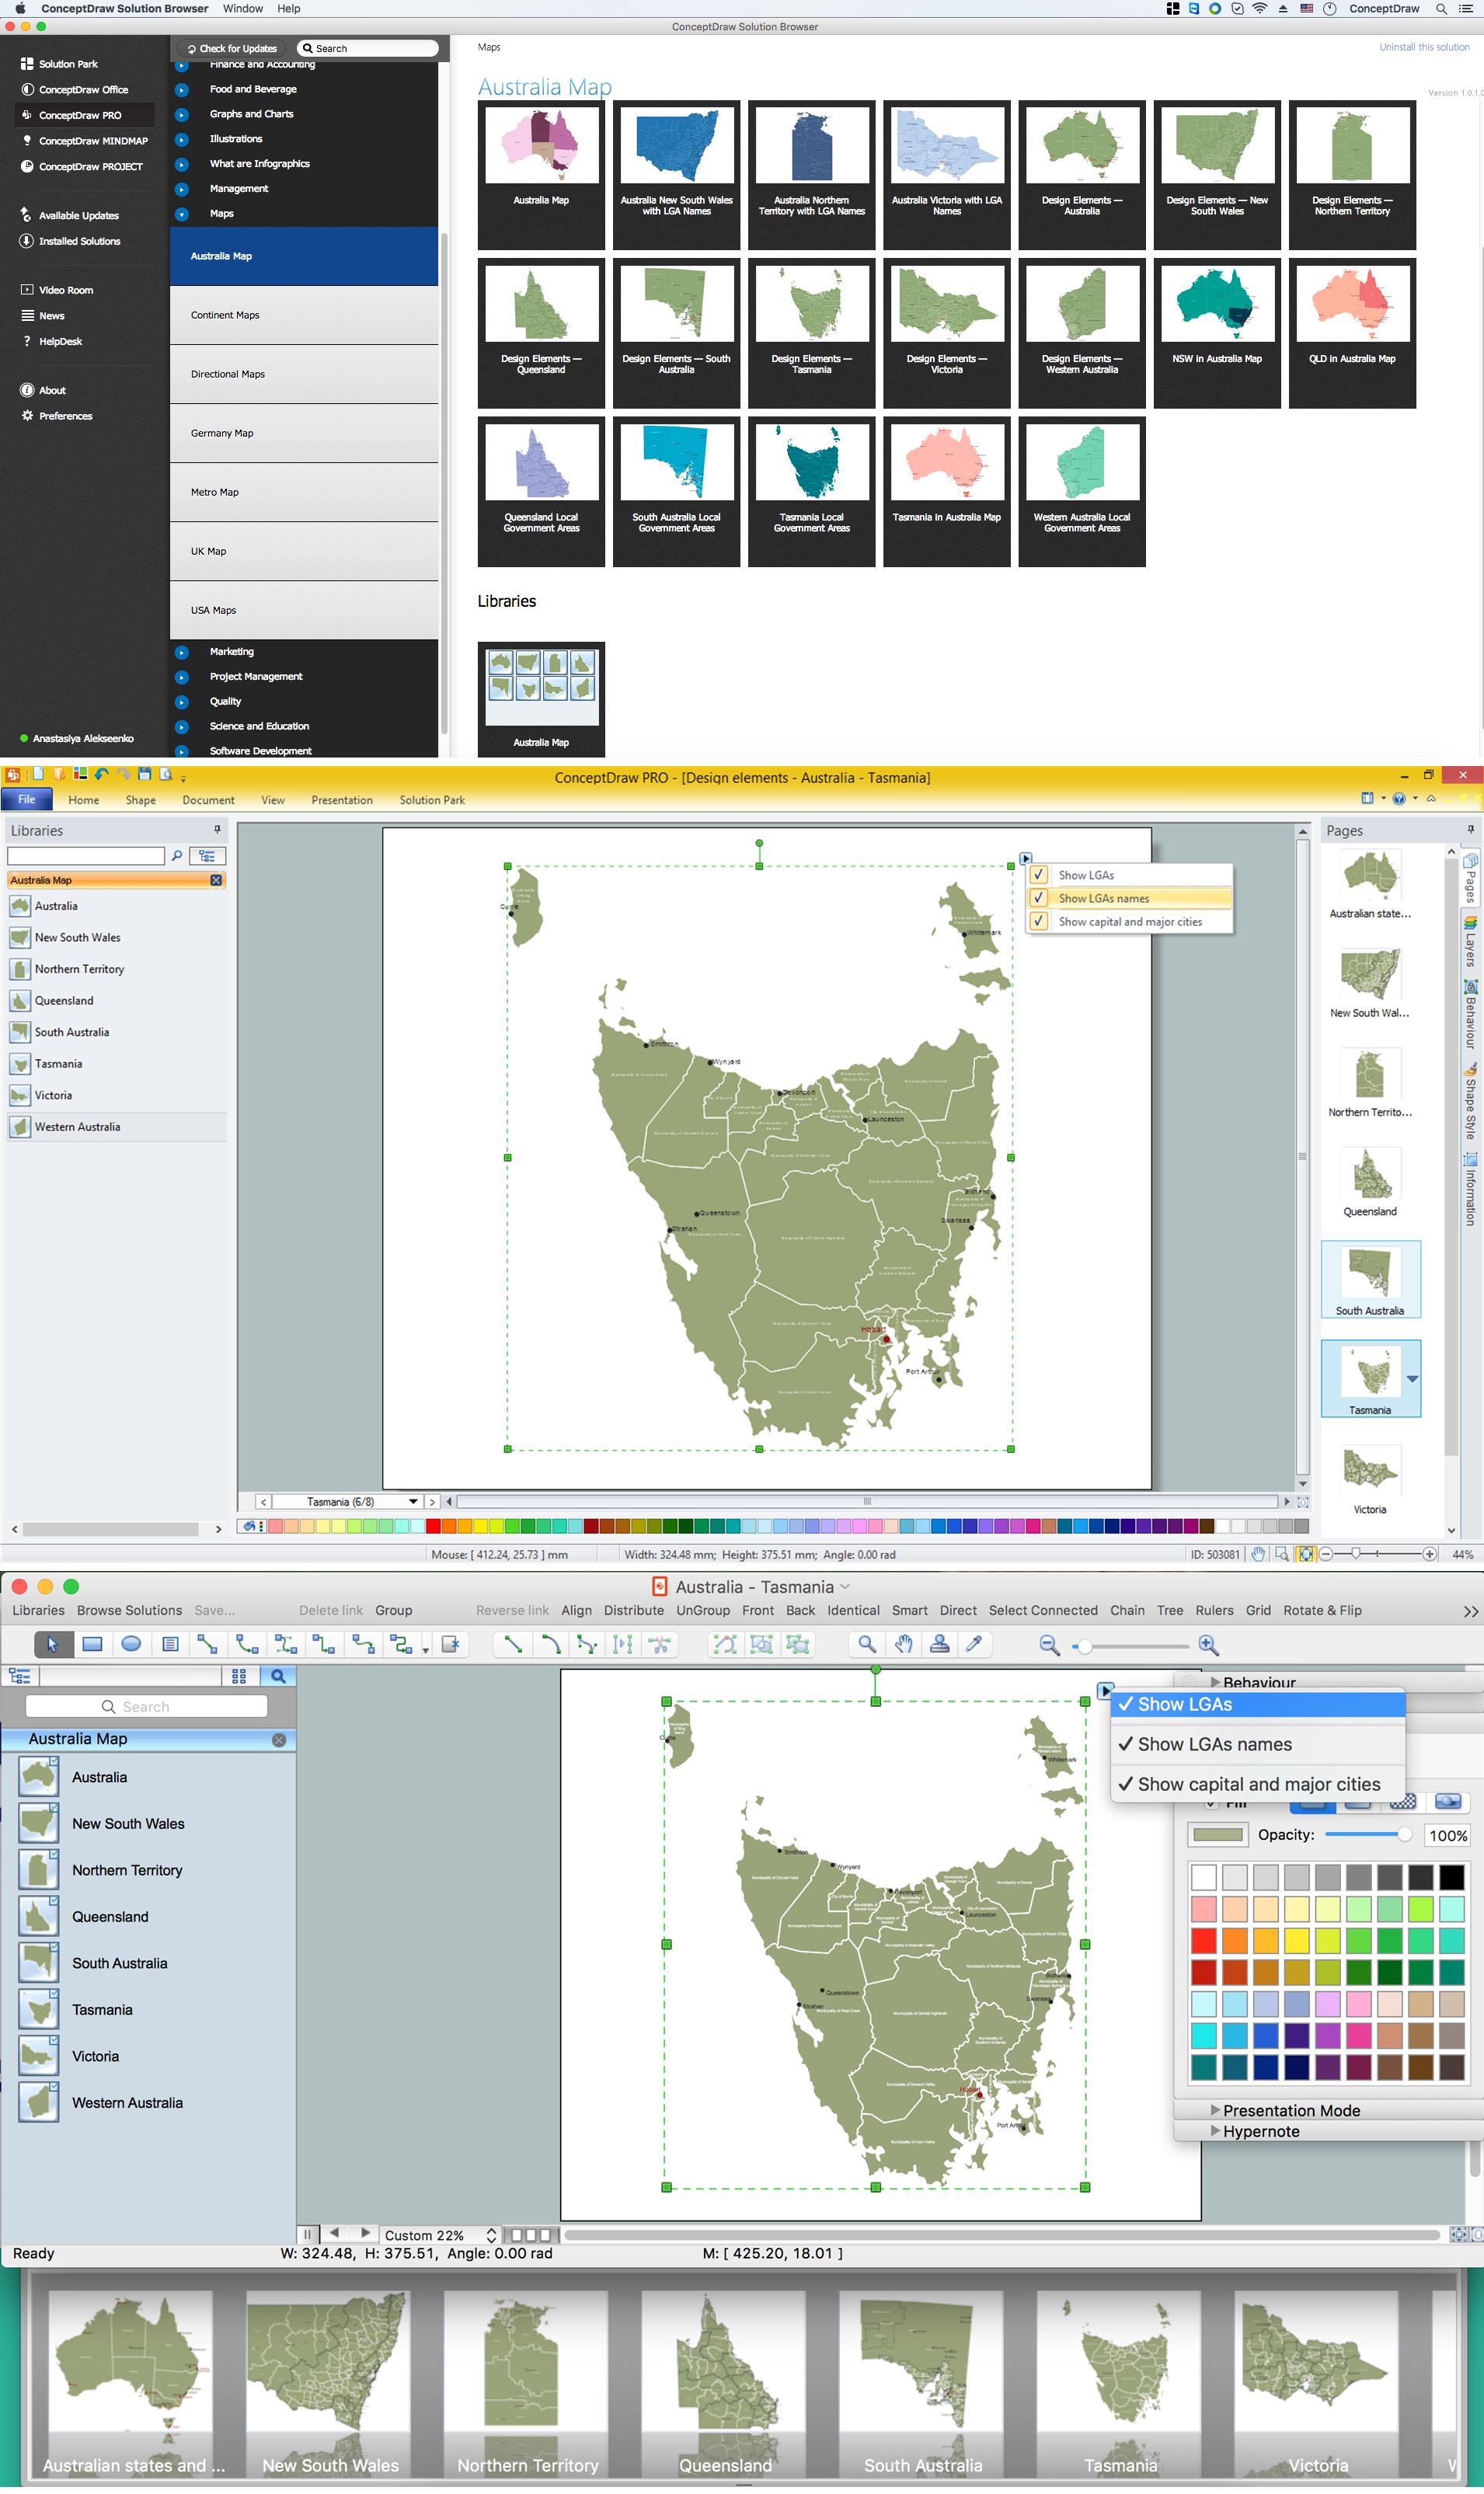 Australia Map - Tasmania